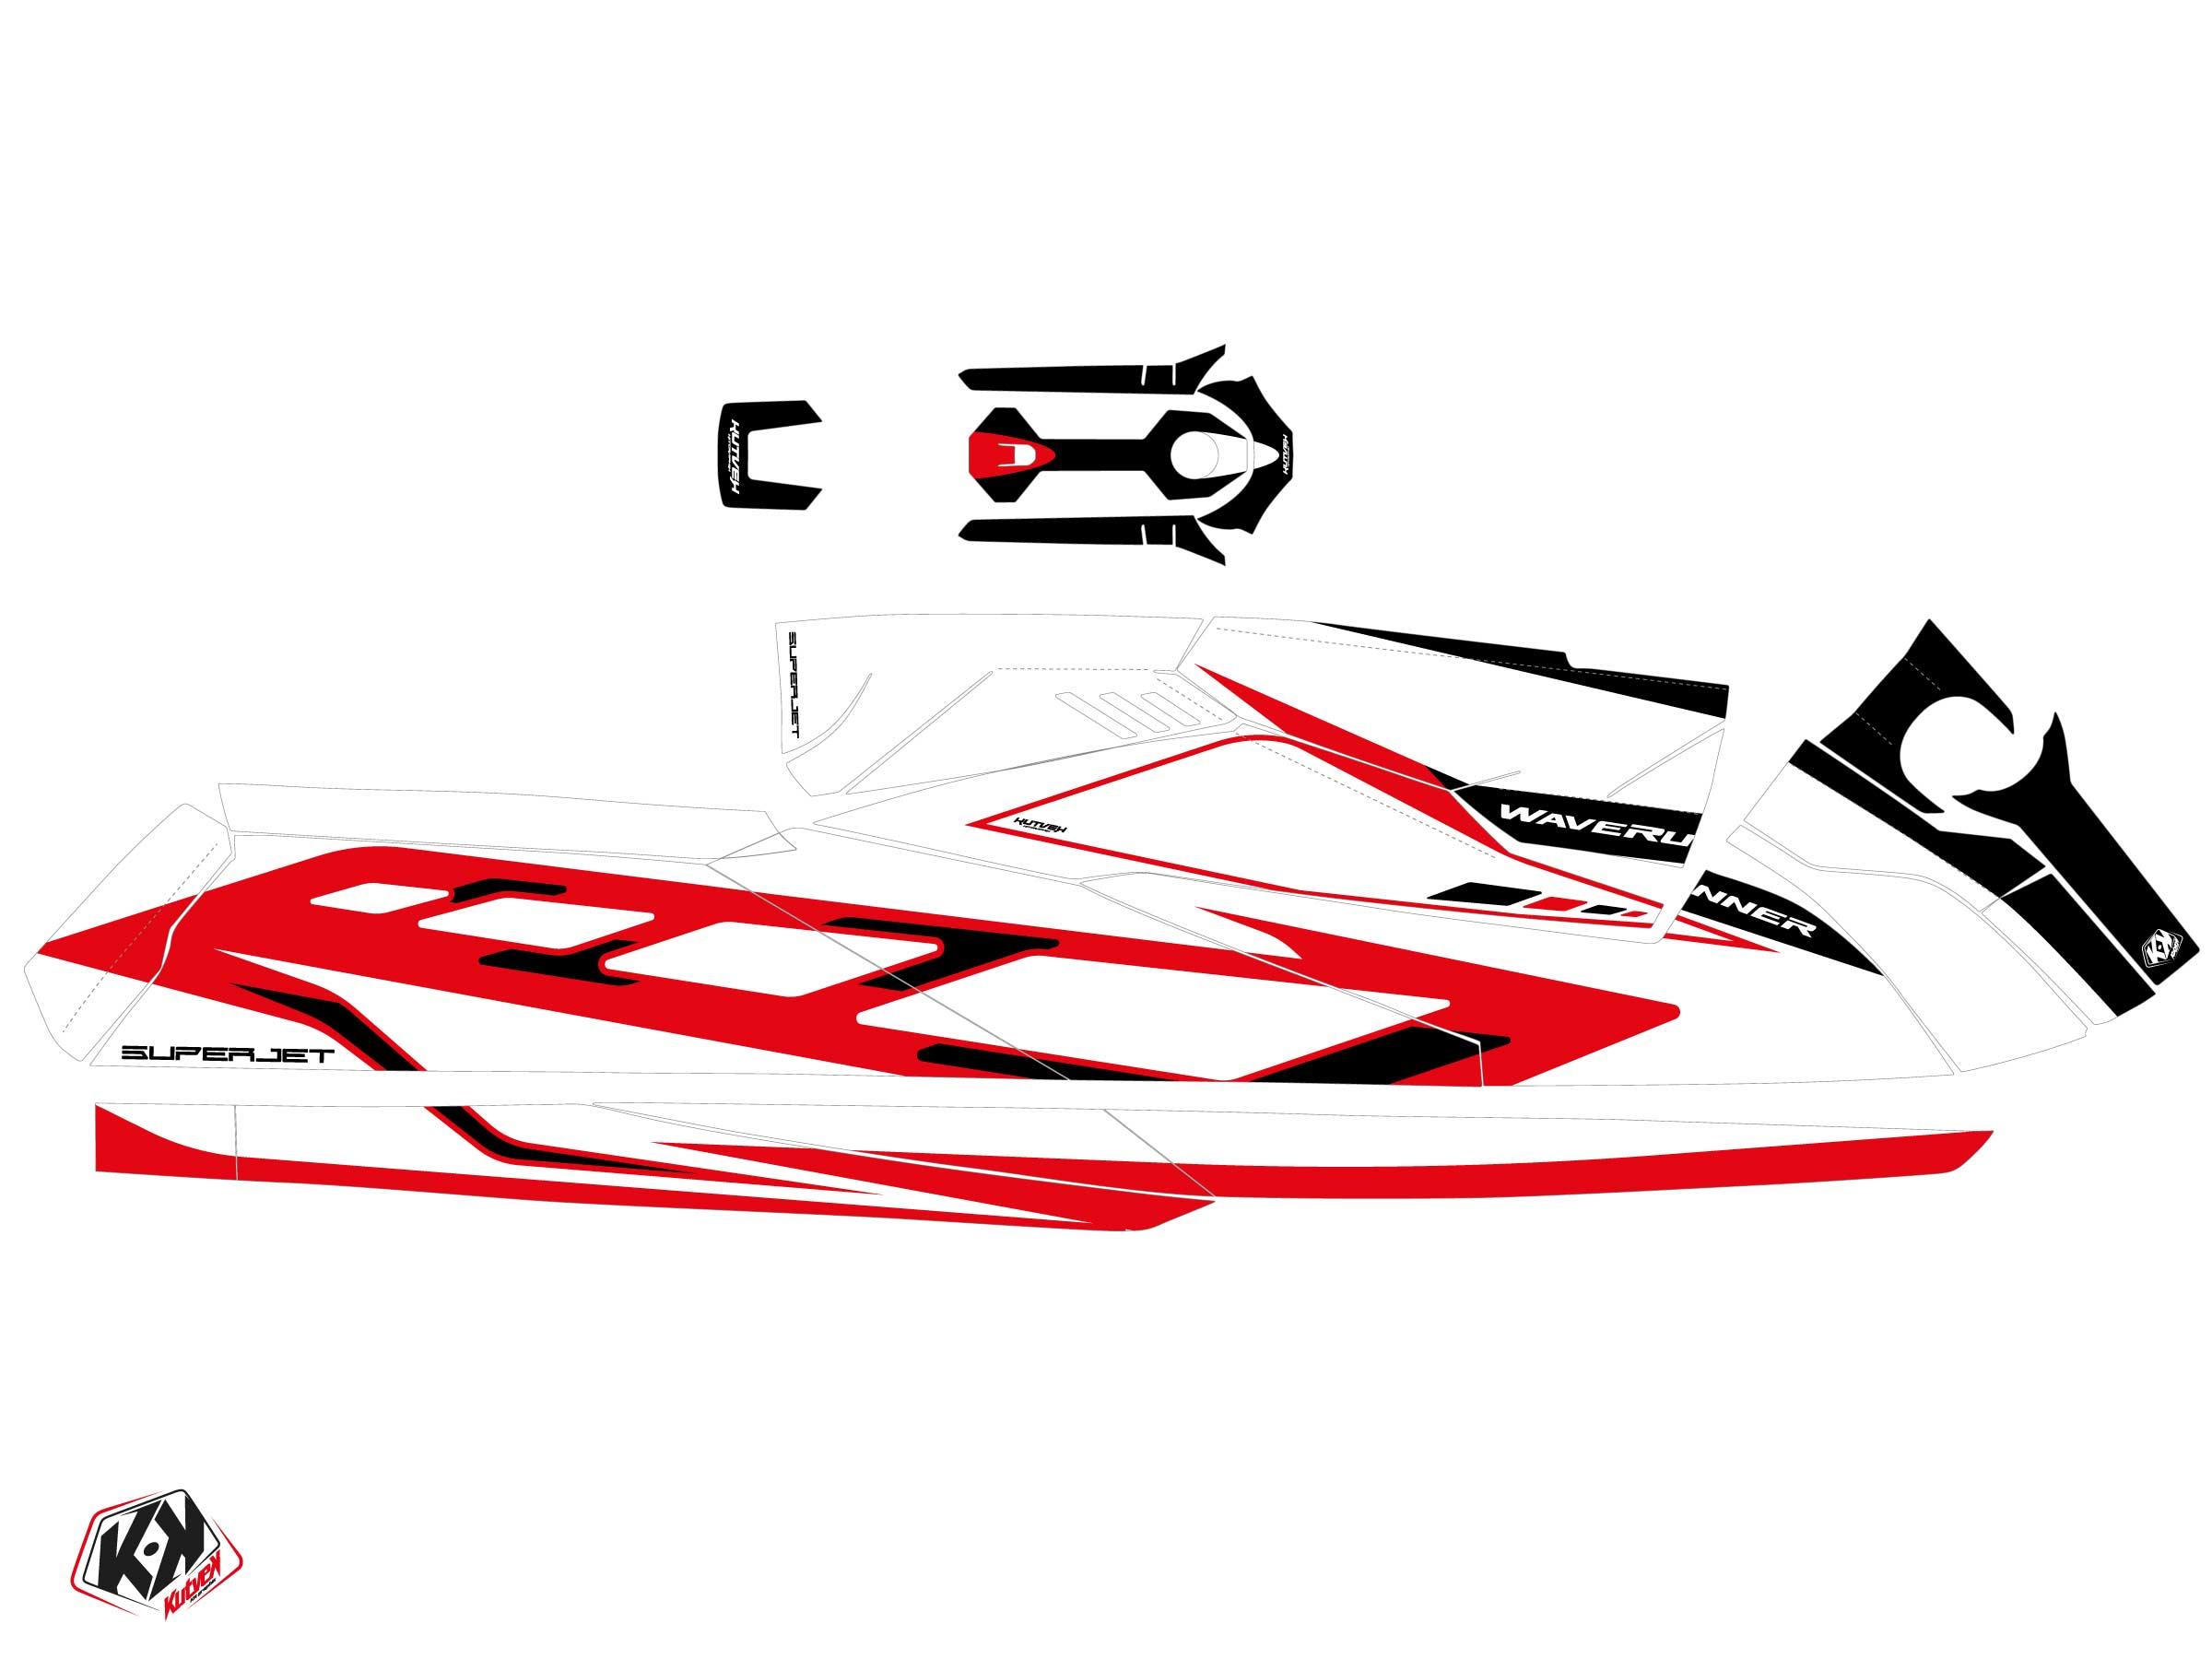 Kit Déco Jet-Ski FLAGSHIP Yamaha Superjet 2021 Rouge